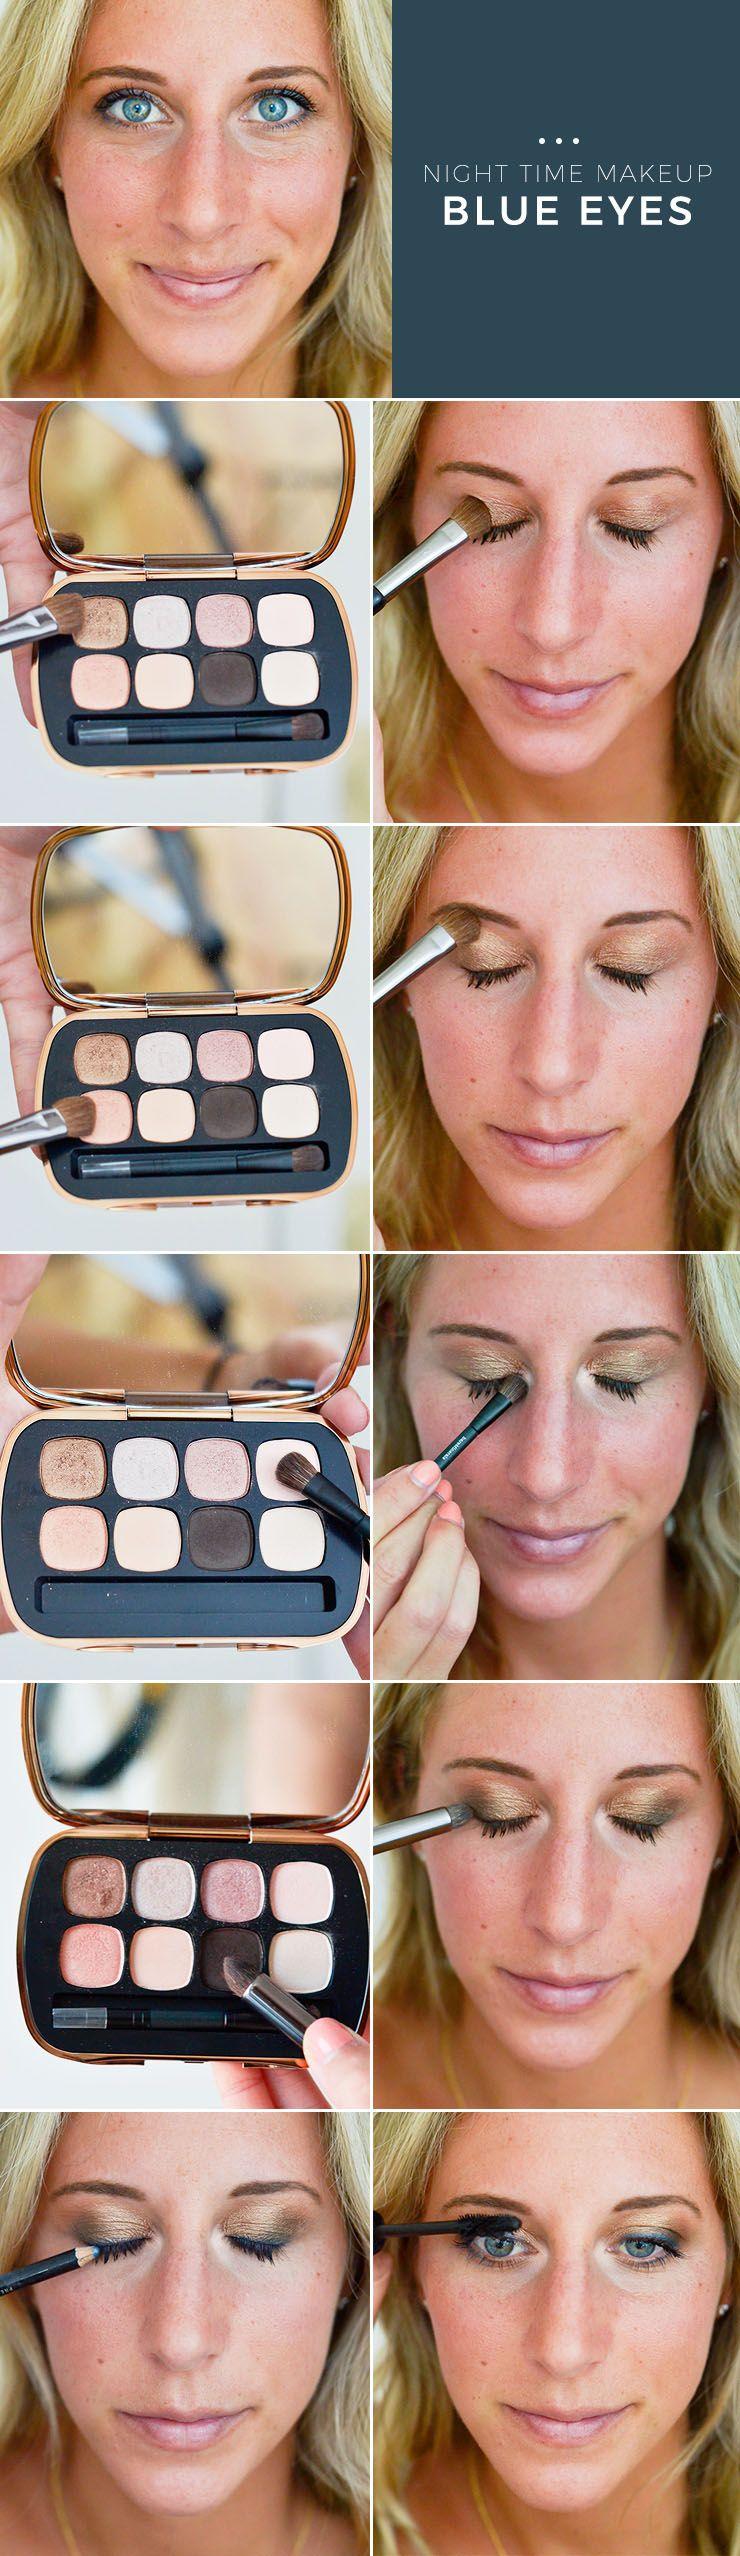 Night makeup for blue eyes makeup tutorial eye makeup gold eye night makeup for blue eyes makeup tutorial baditri Image collections